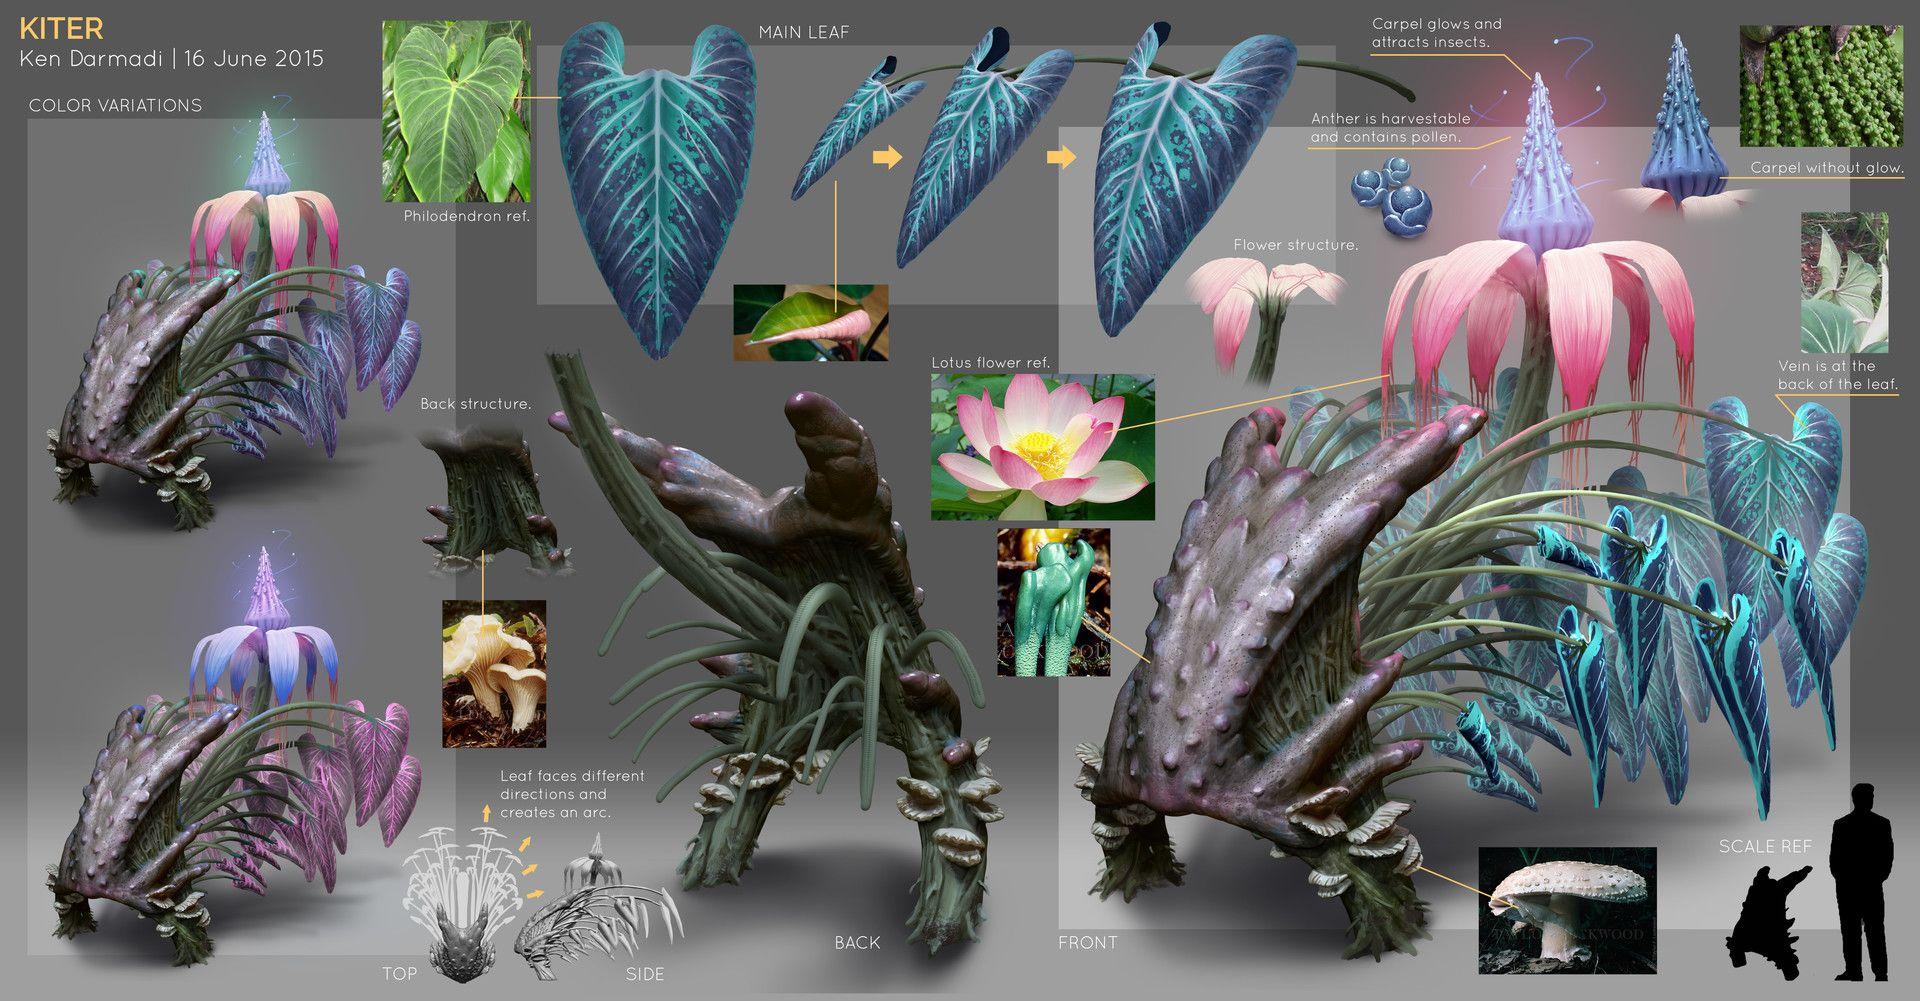 ArtStation - Cancelled Project - Plants, Ken Darmadi